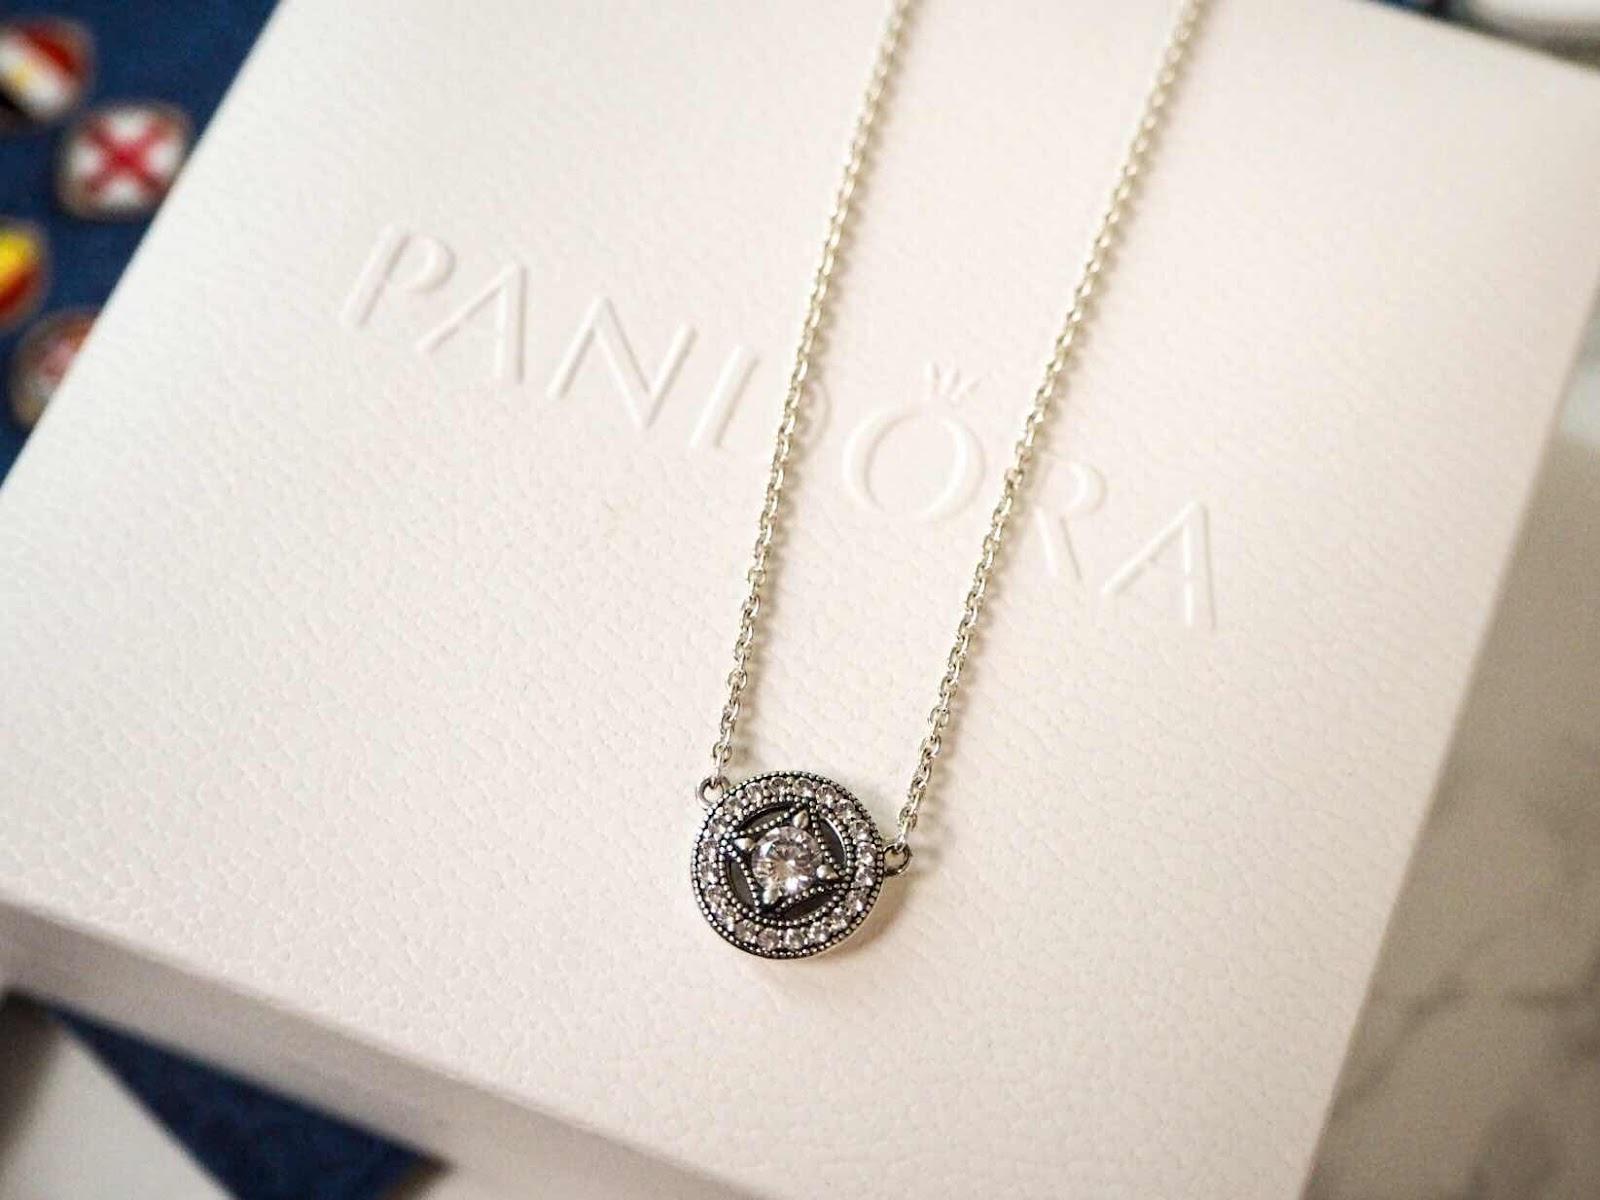 london-lifestyle-blog-PANDORA-classic-elegance-necklace